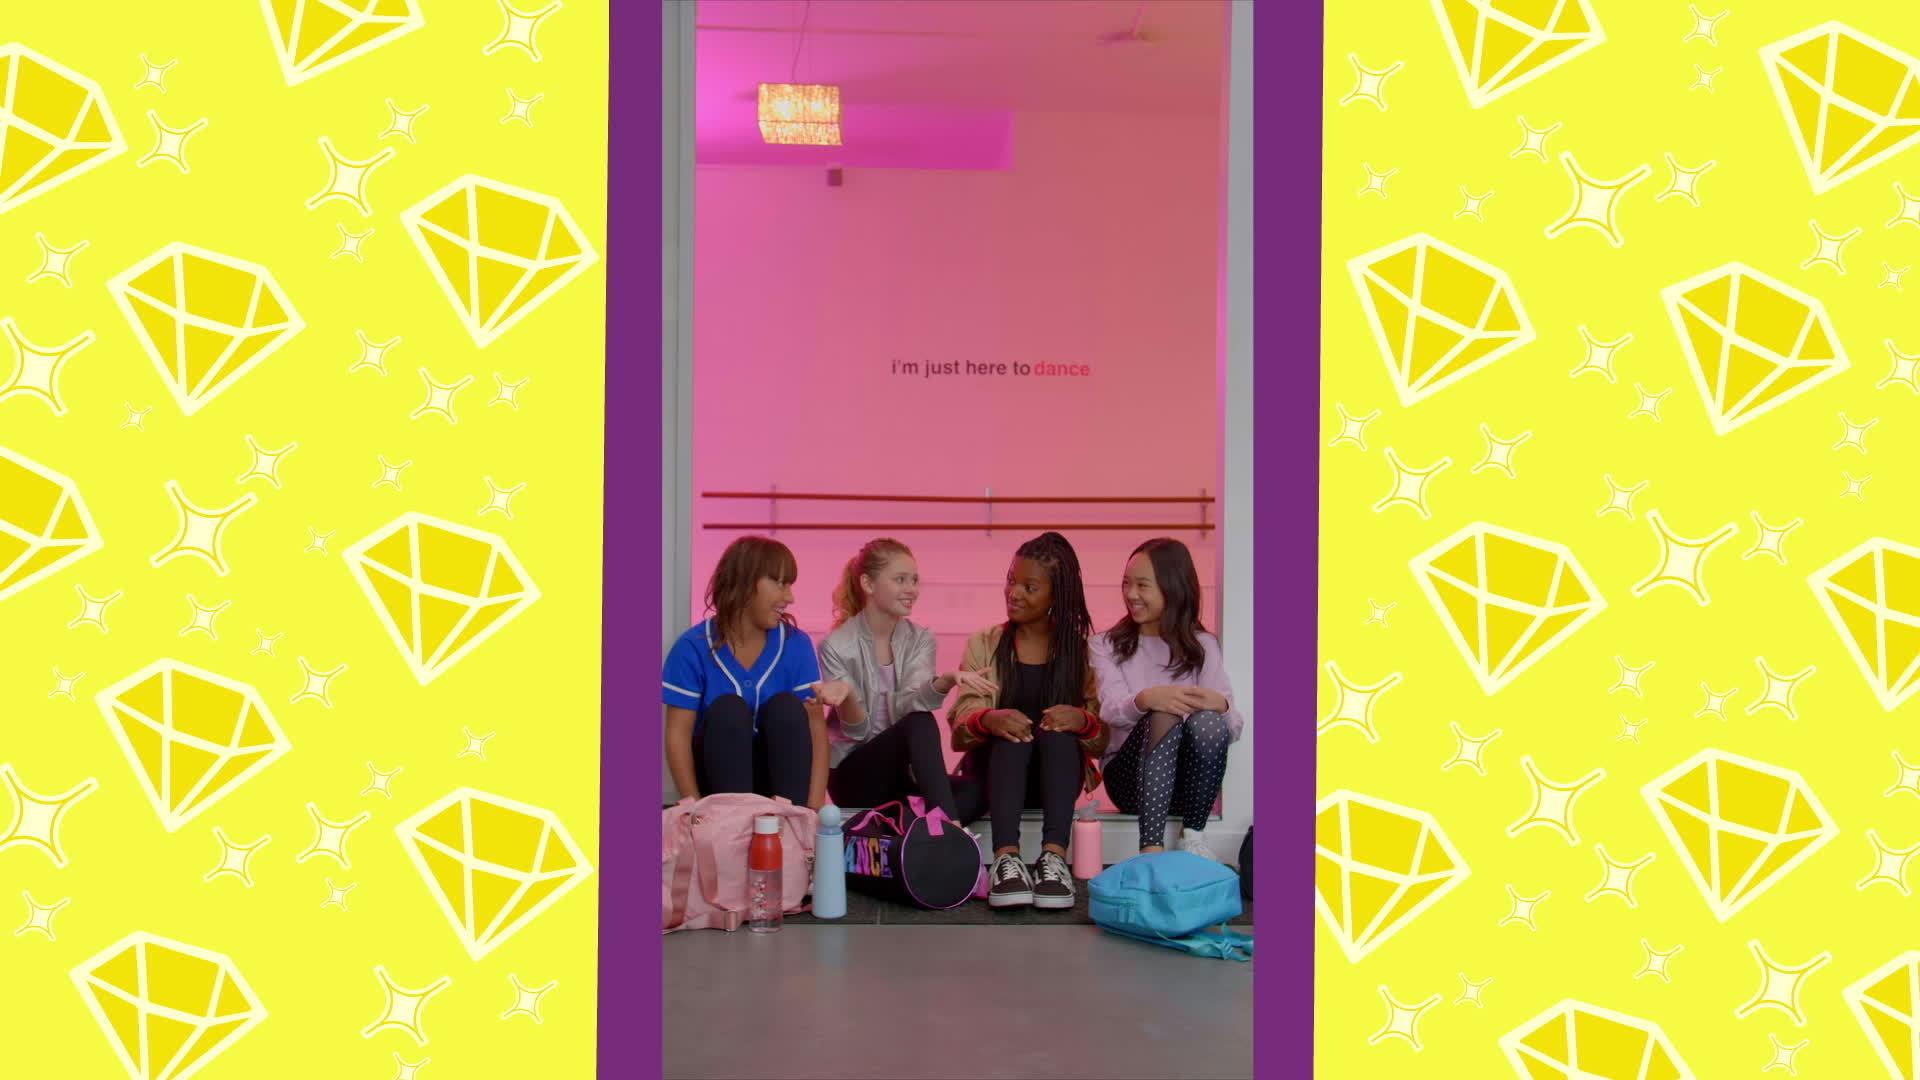 Ruby's Gems: Just Dance